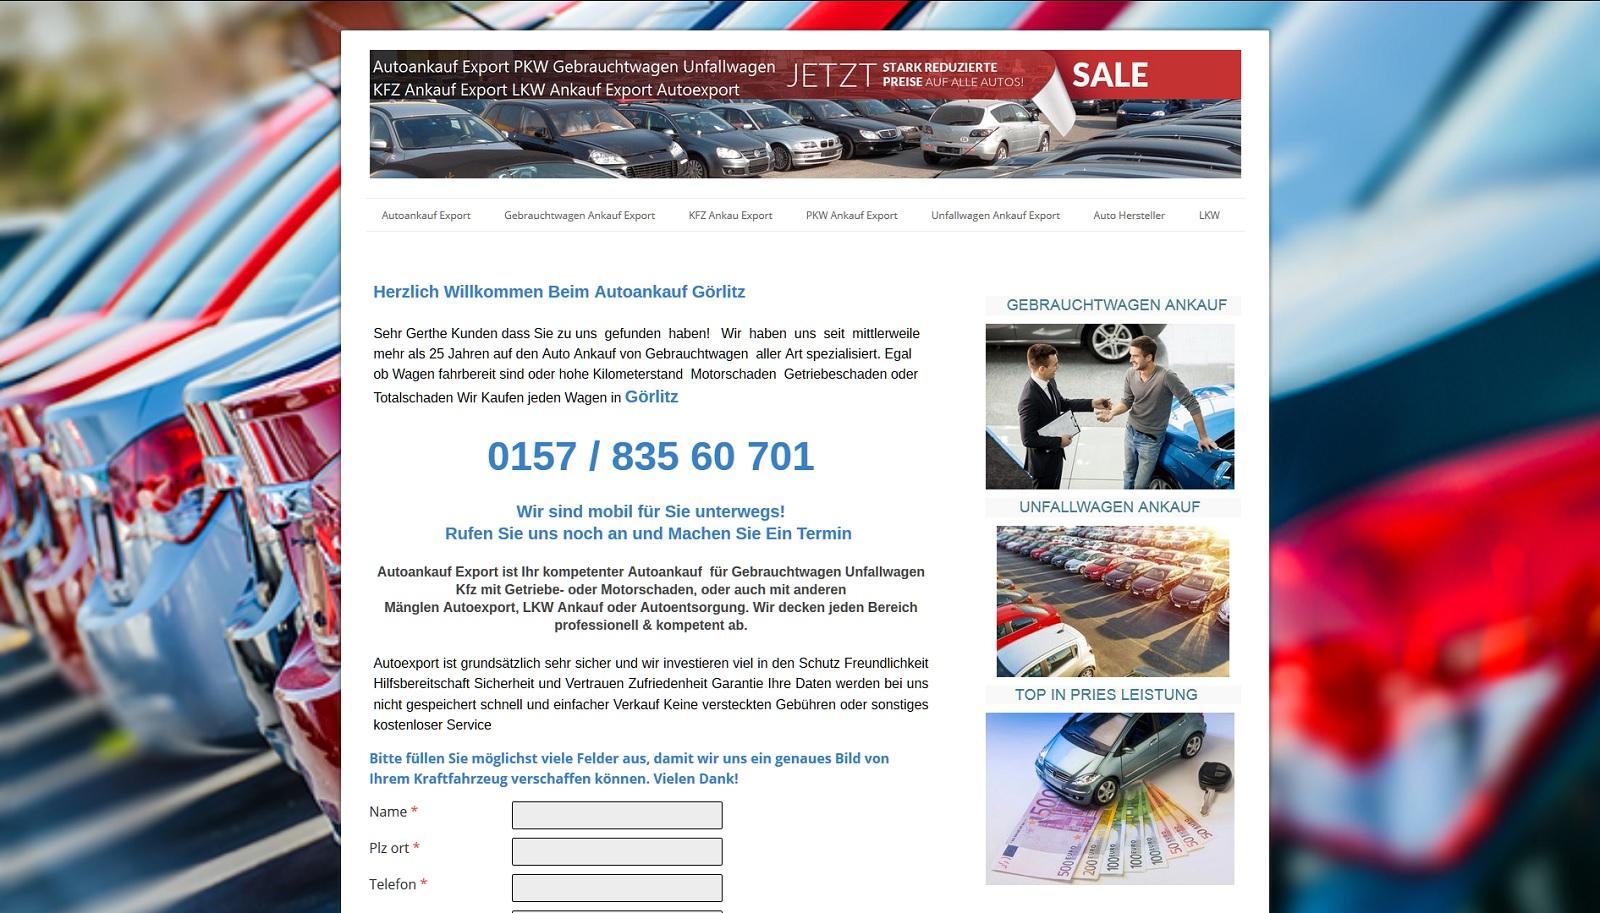 auto-ankauf-export.de - Autoankauf Böblingen